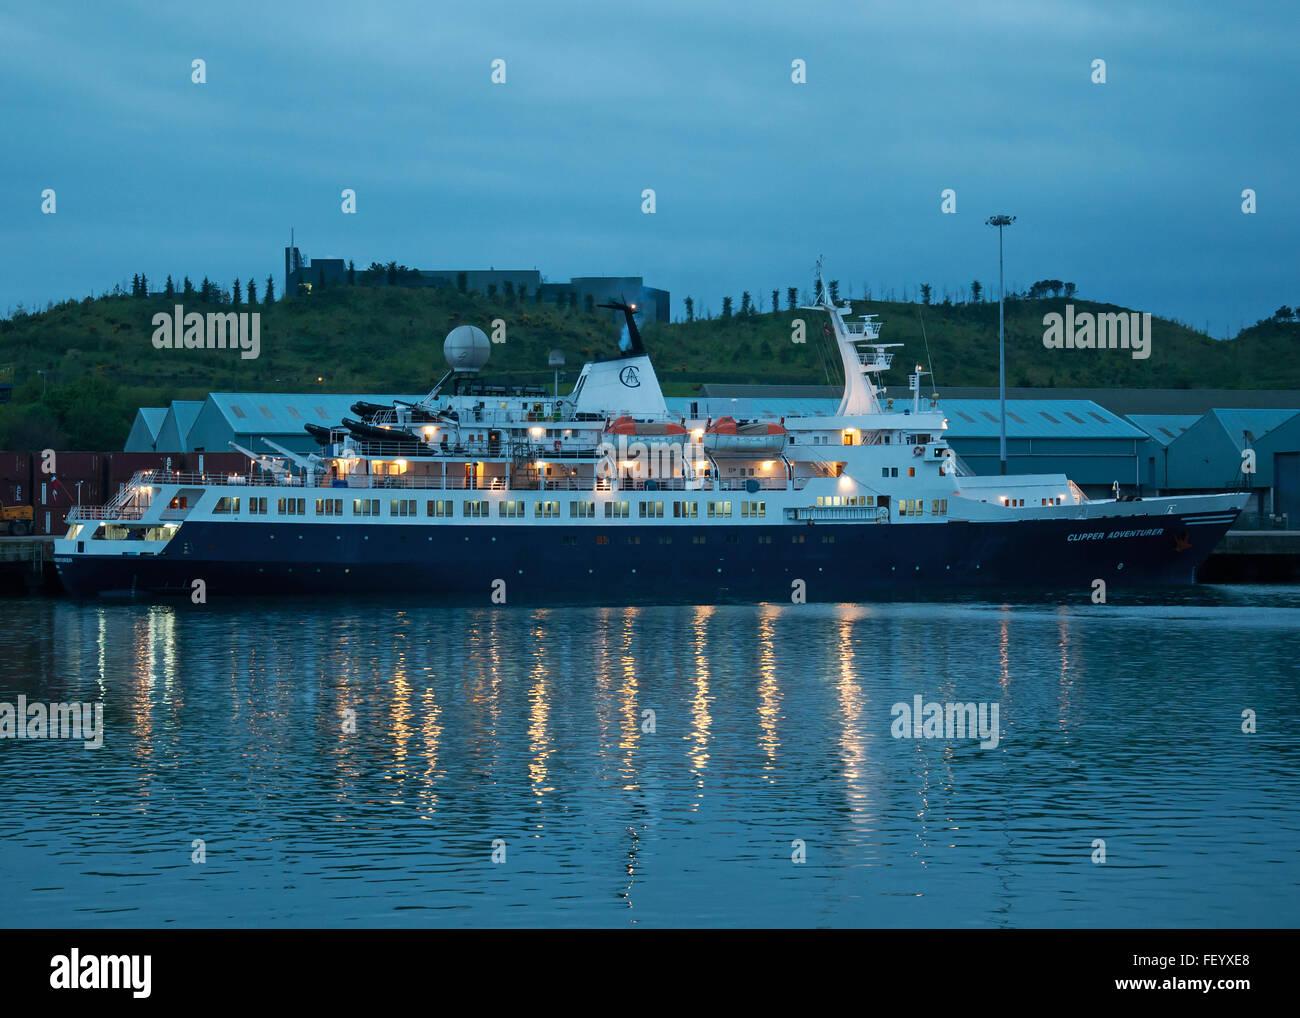 Luxury cruise liner 'M/V Clipper Adventurer' moored in Ringaskiddy, Port Of Cork, Cork, Ireland. - Stock Image